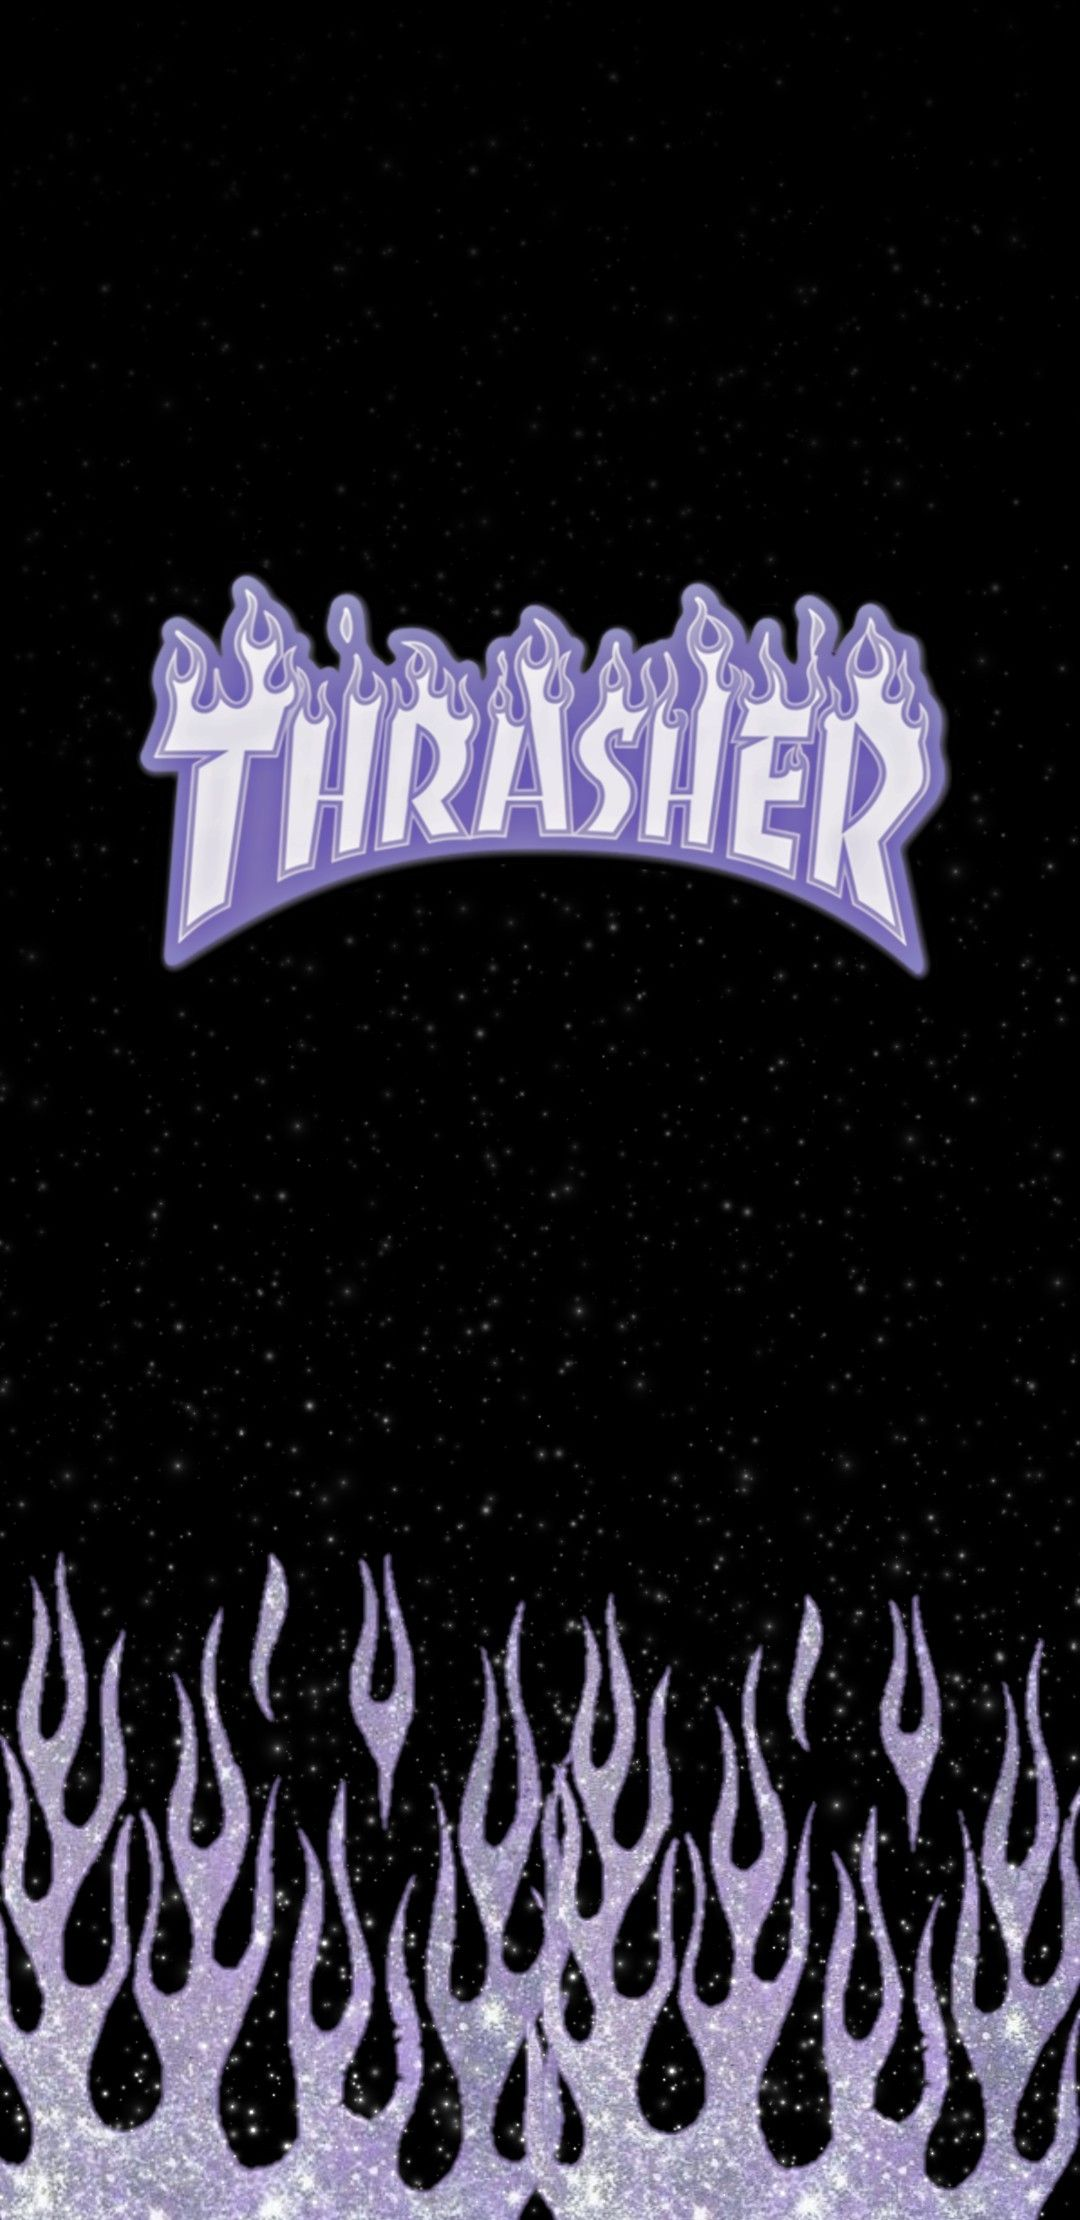 Purple Glitter Thrasher In 2020 Iphone Wallpaper Pattern Black And Purple Wallpaper Aesthetic Iphone Wallpaper